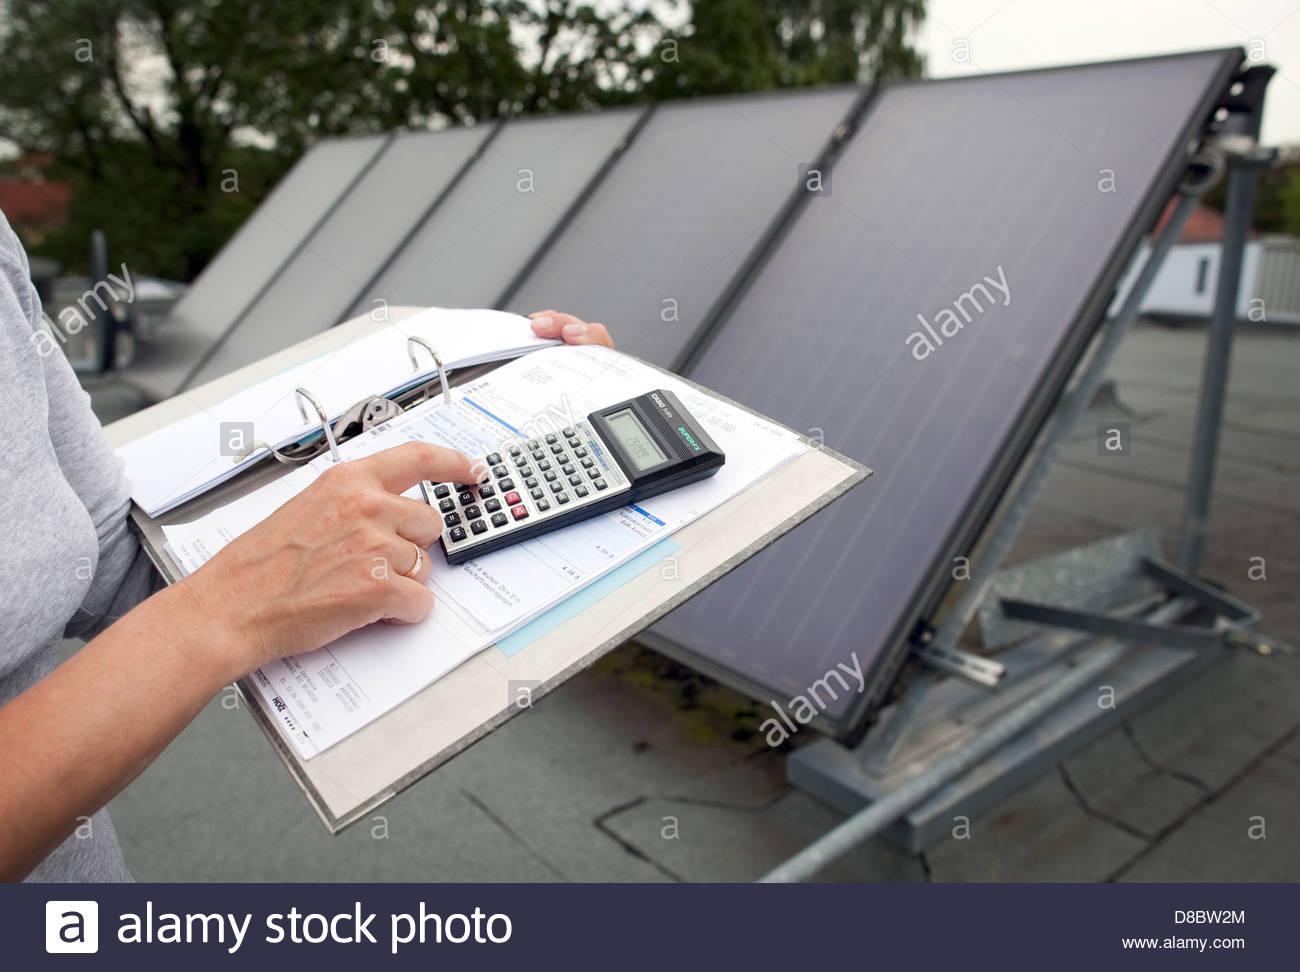 Technician holding a calculator near solar panels - Stock Image